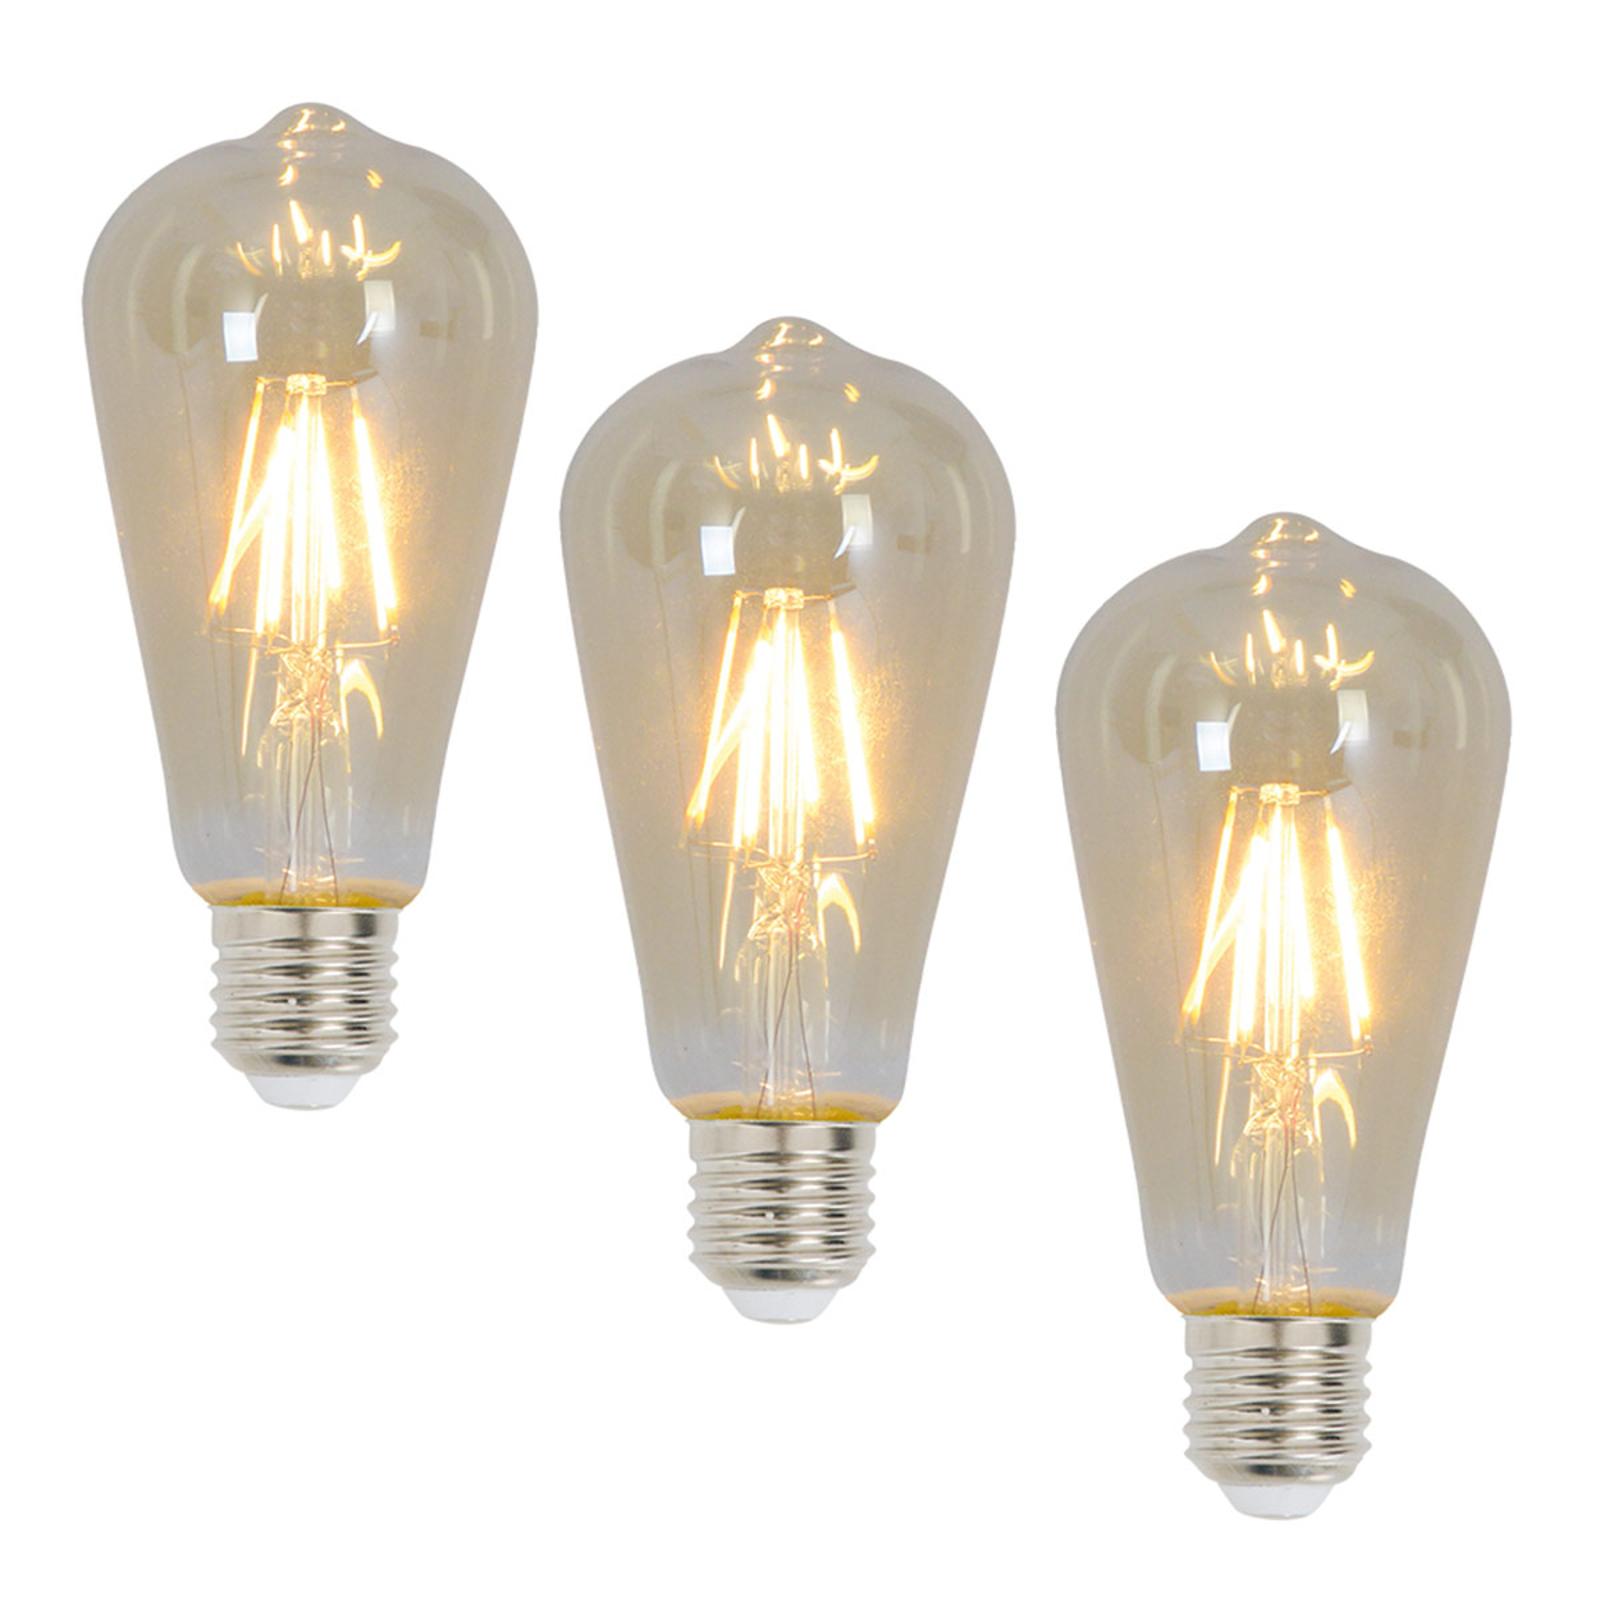 Rustiikki LED-lamppu E27 4 W, 300 lm, 3 kpl 2200 K